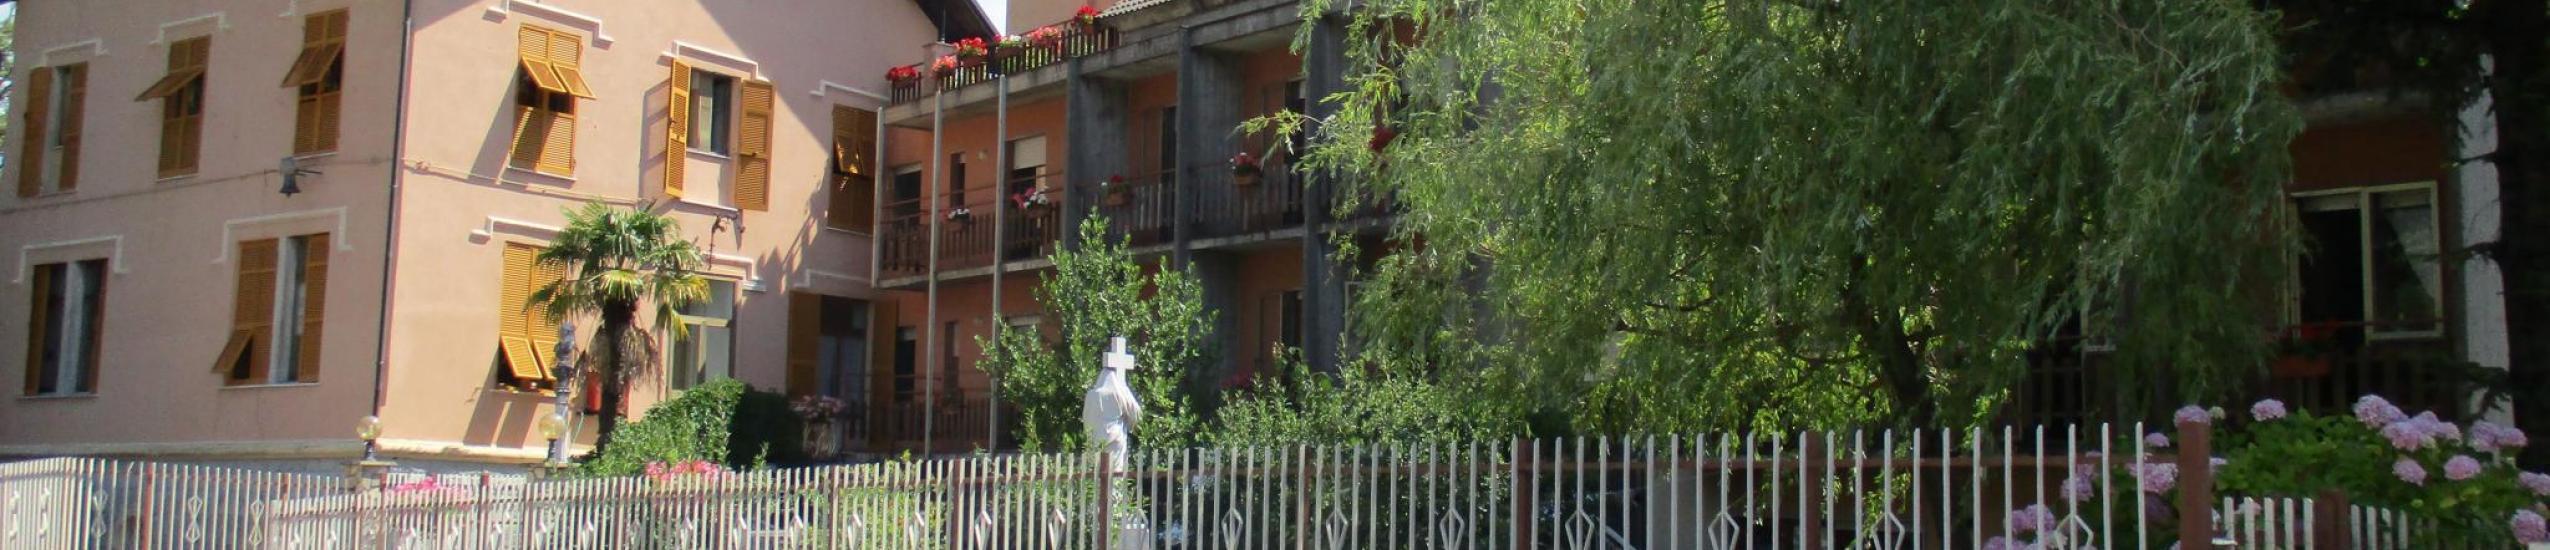 Residenza protetta Don Candido Garbarino